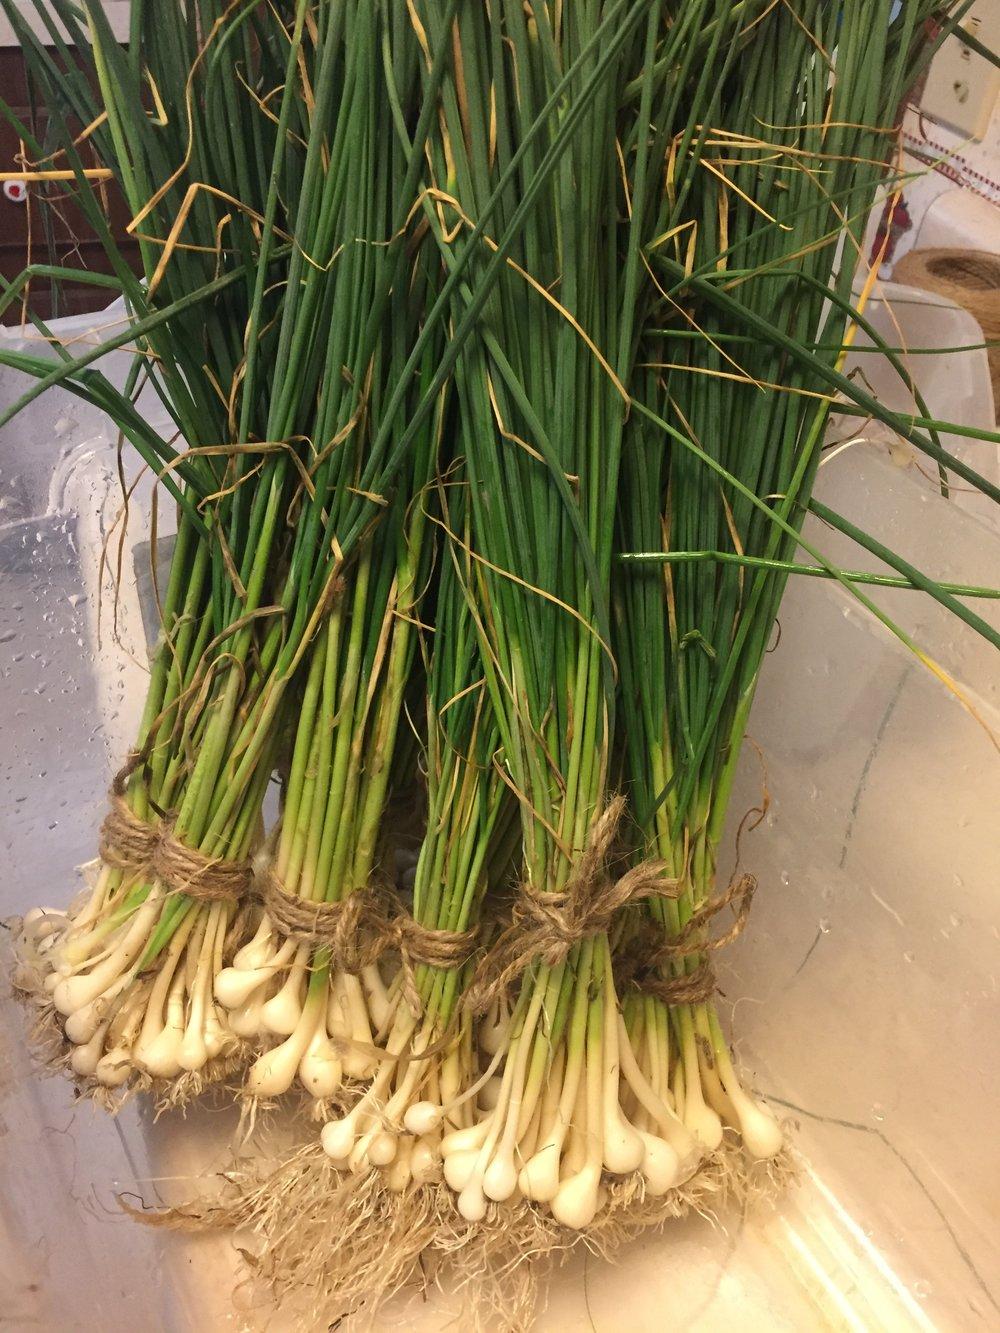 Wild Spring onions!